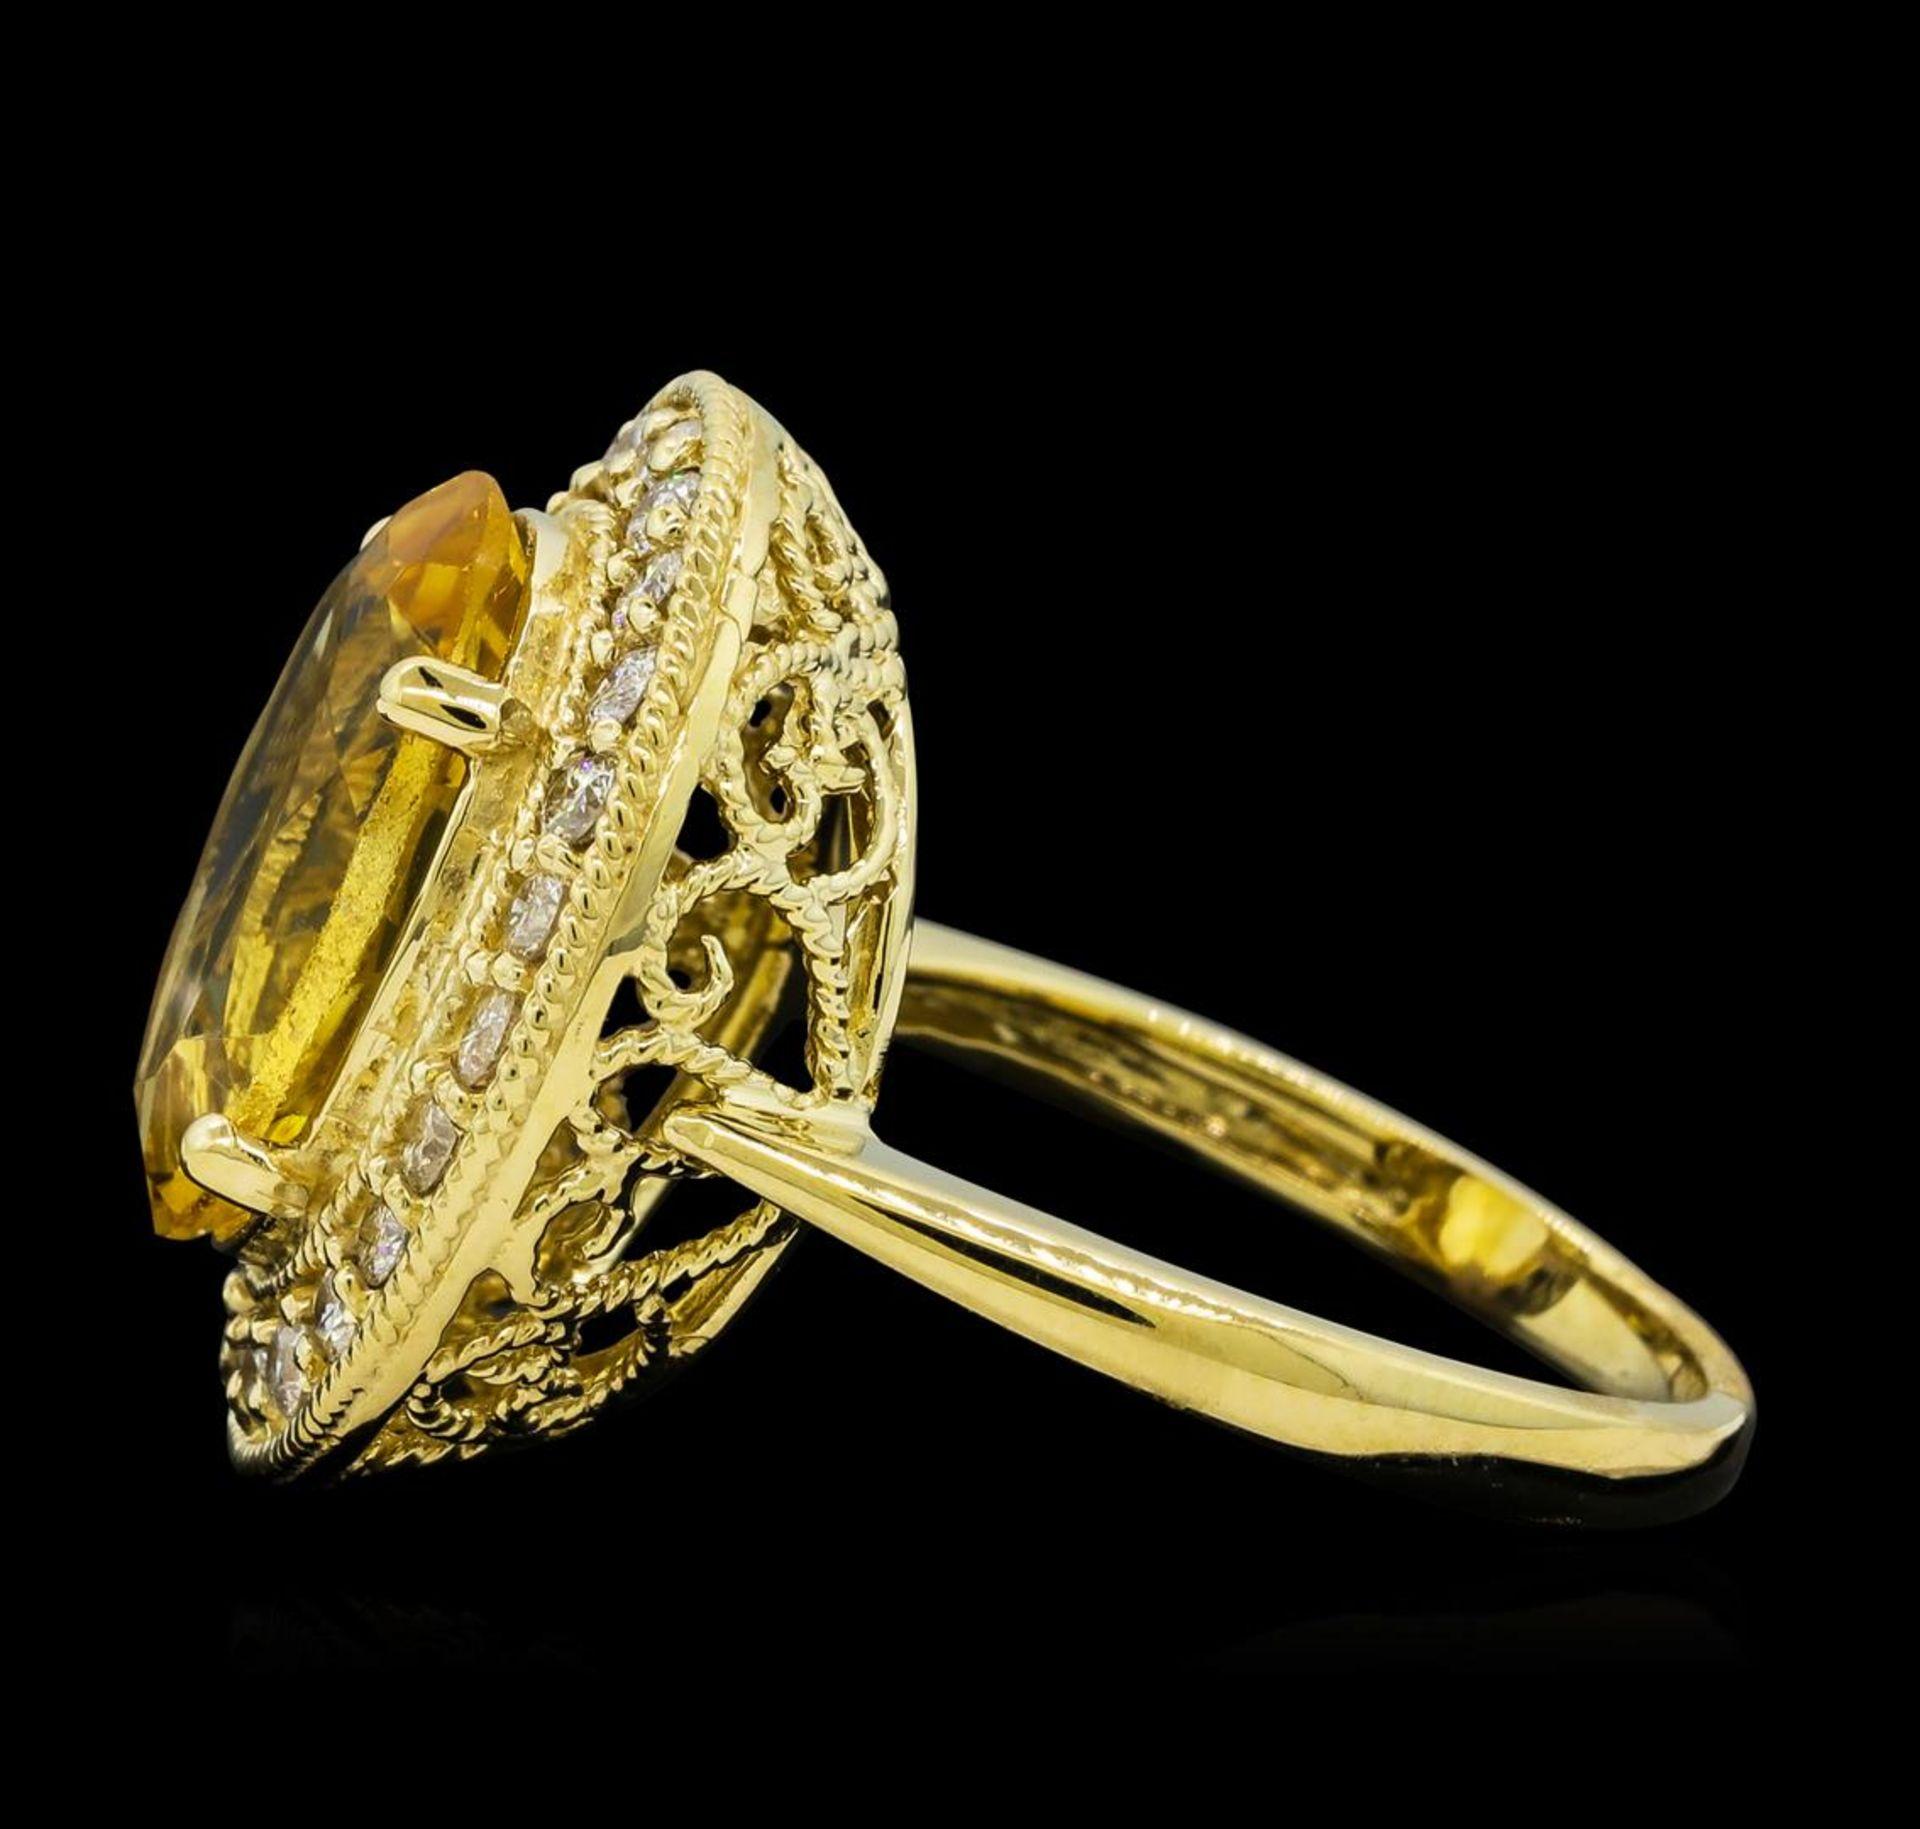 4.22 ctw Citrine Quartz and Diamond Ring - 14KT Yellow Gold - Image 3 of 4